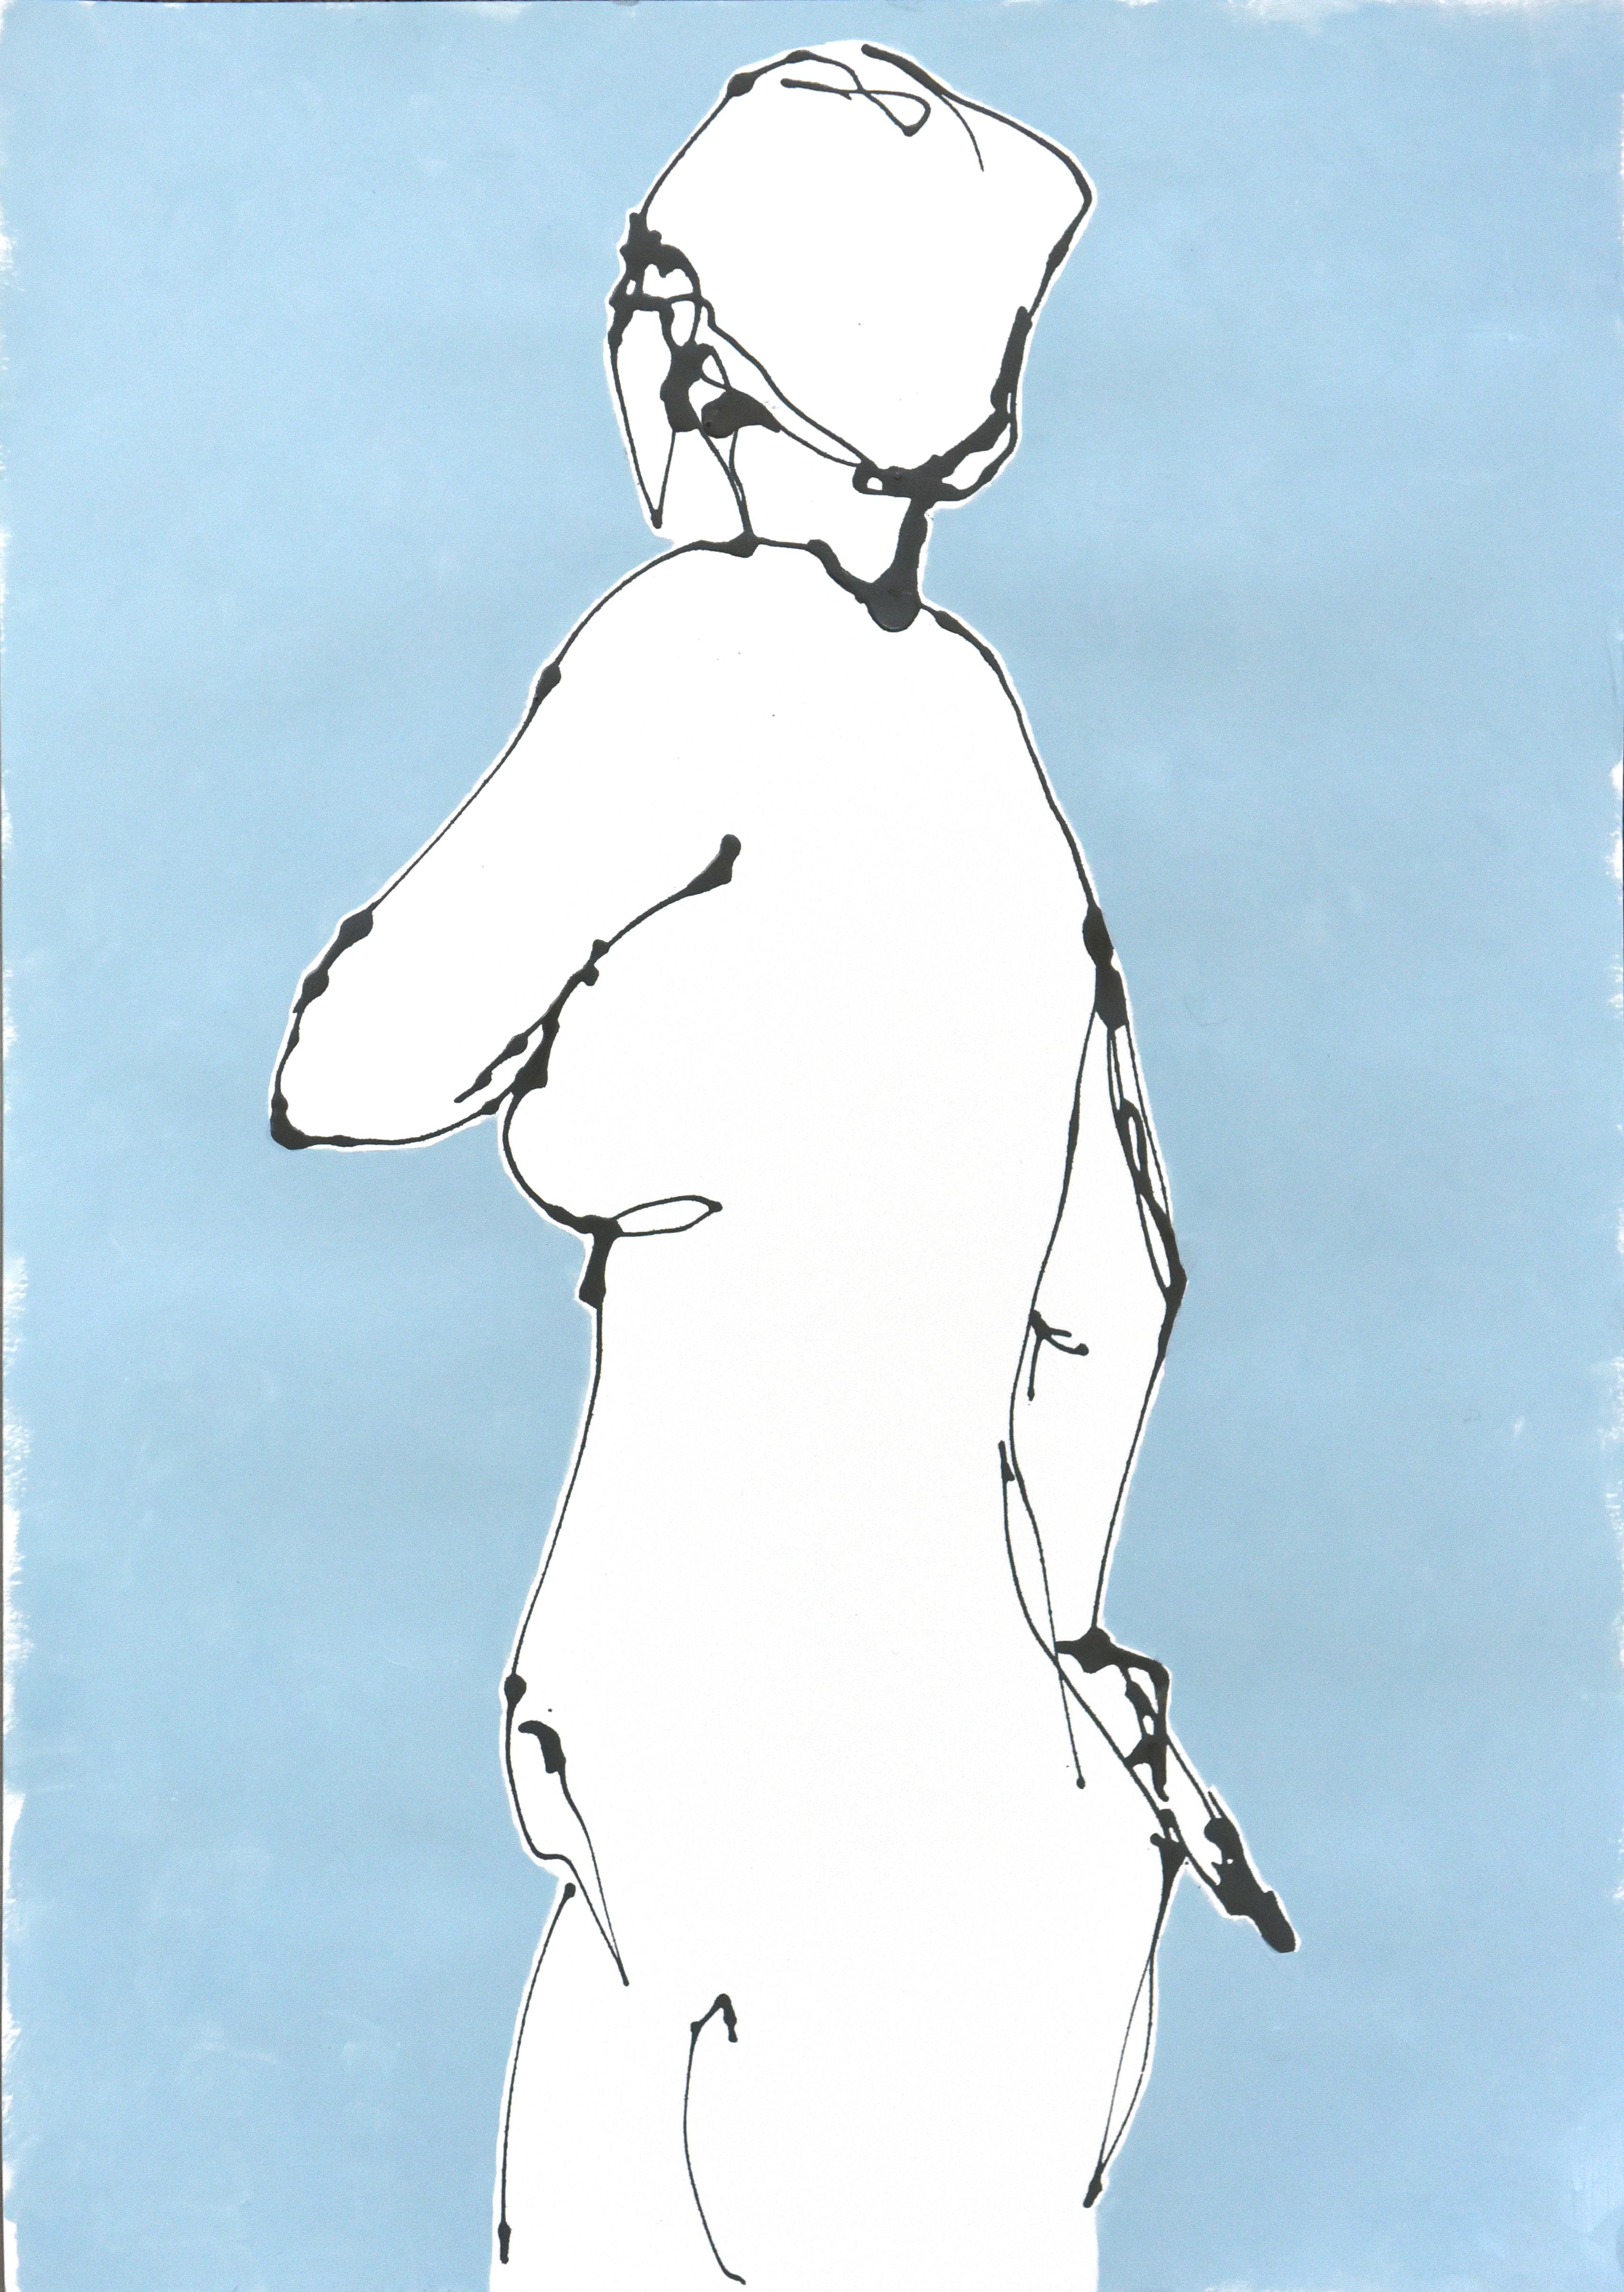 Teal II (acrylic on paper, 39.5 x 57.5cms, framed)